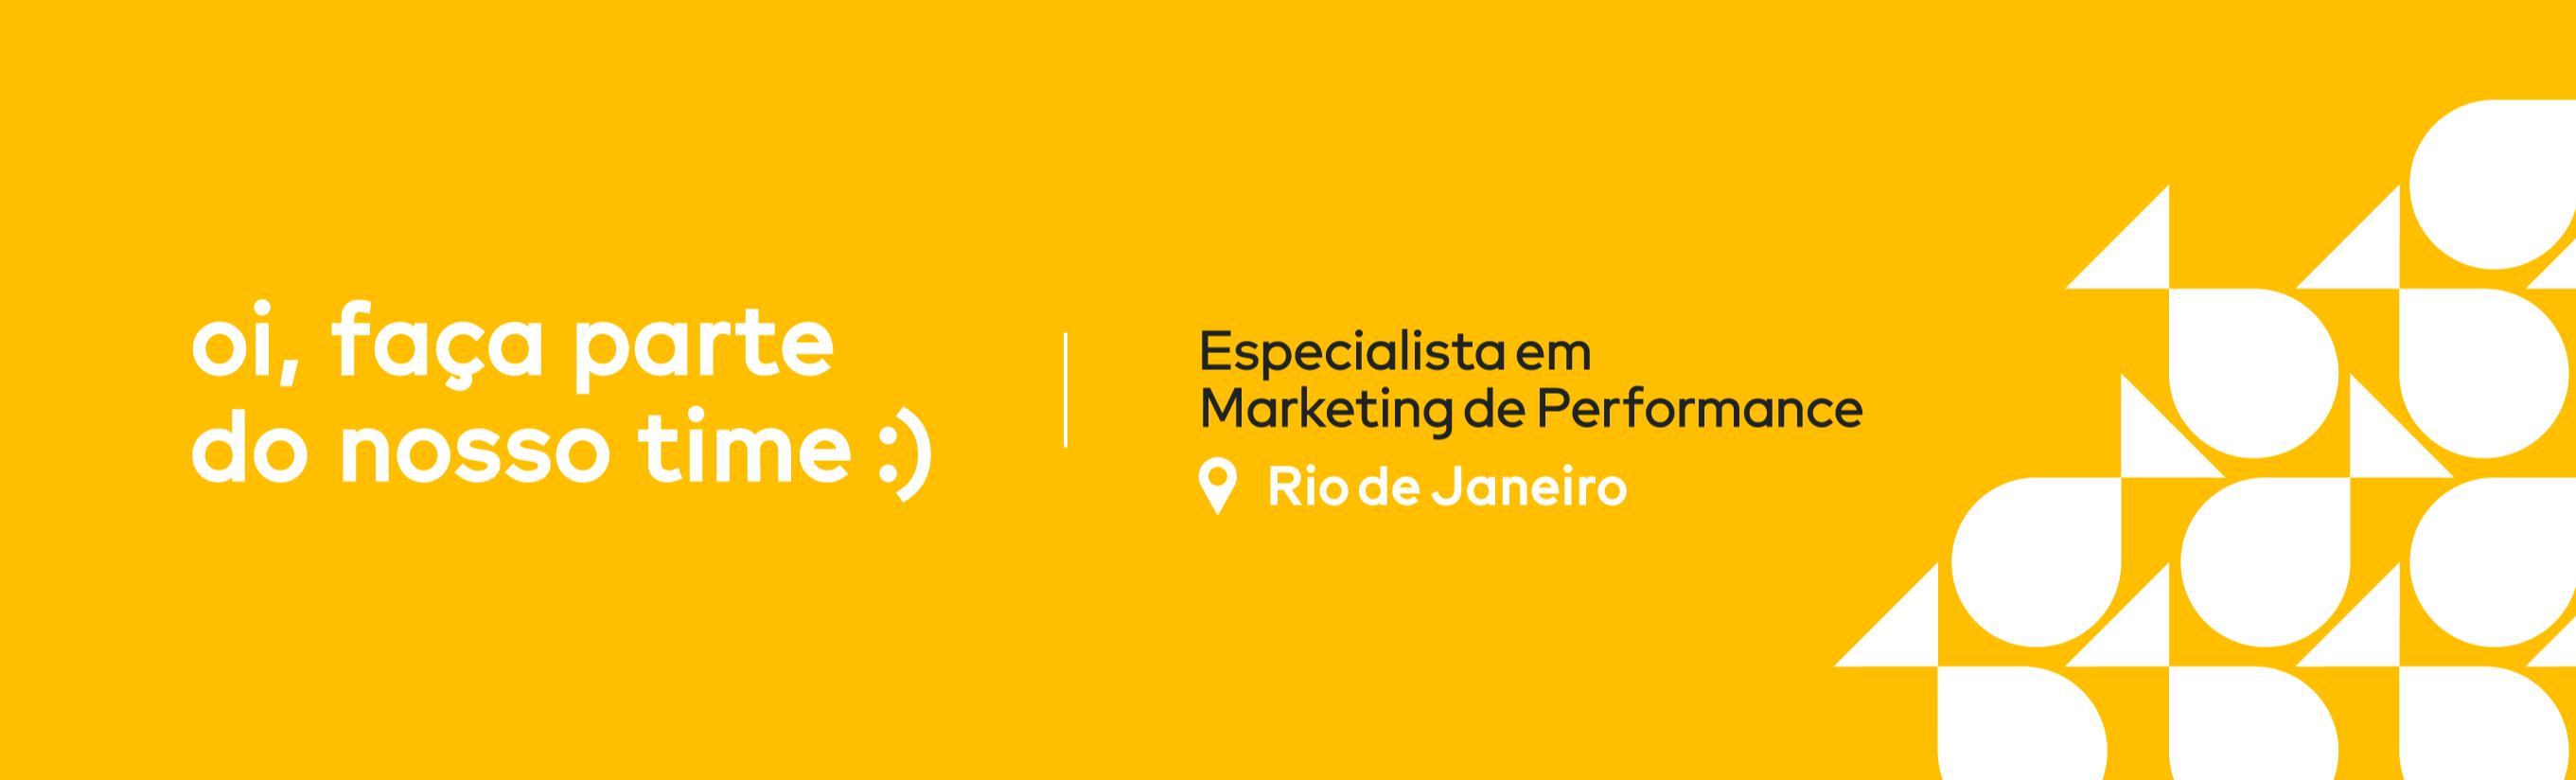 Especialista de Marketing de Performance